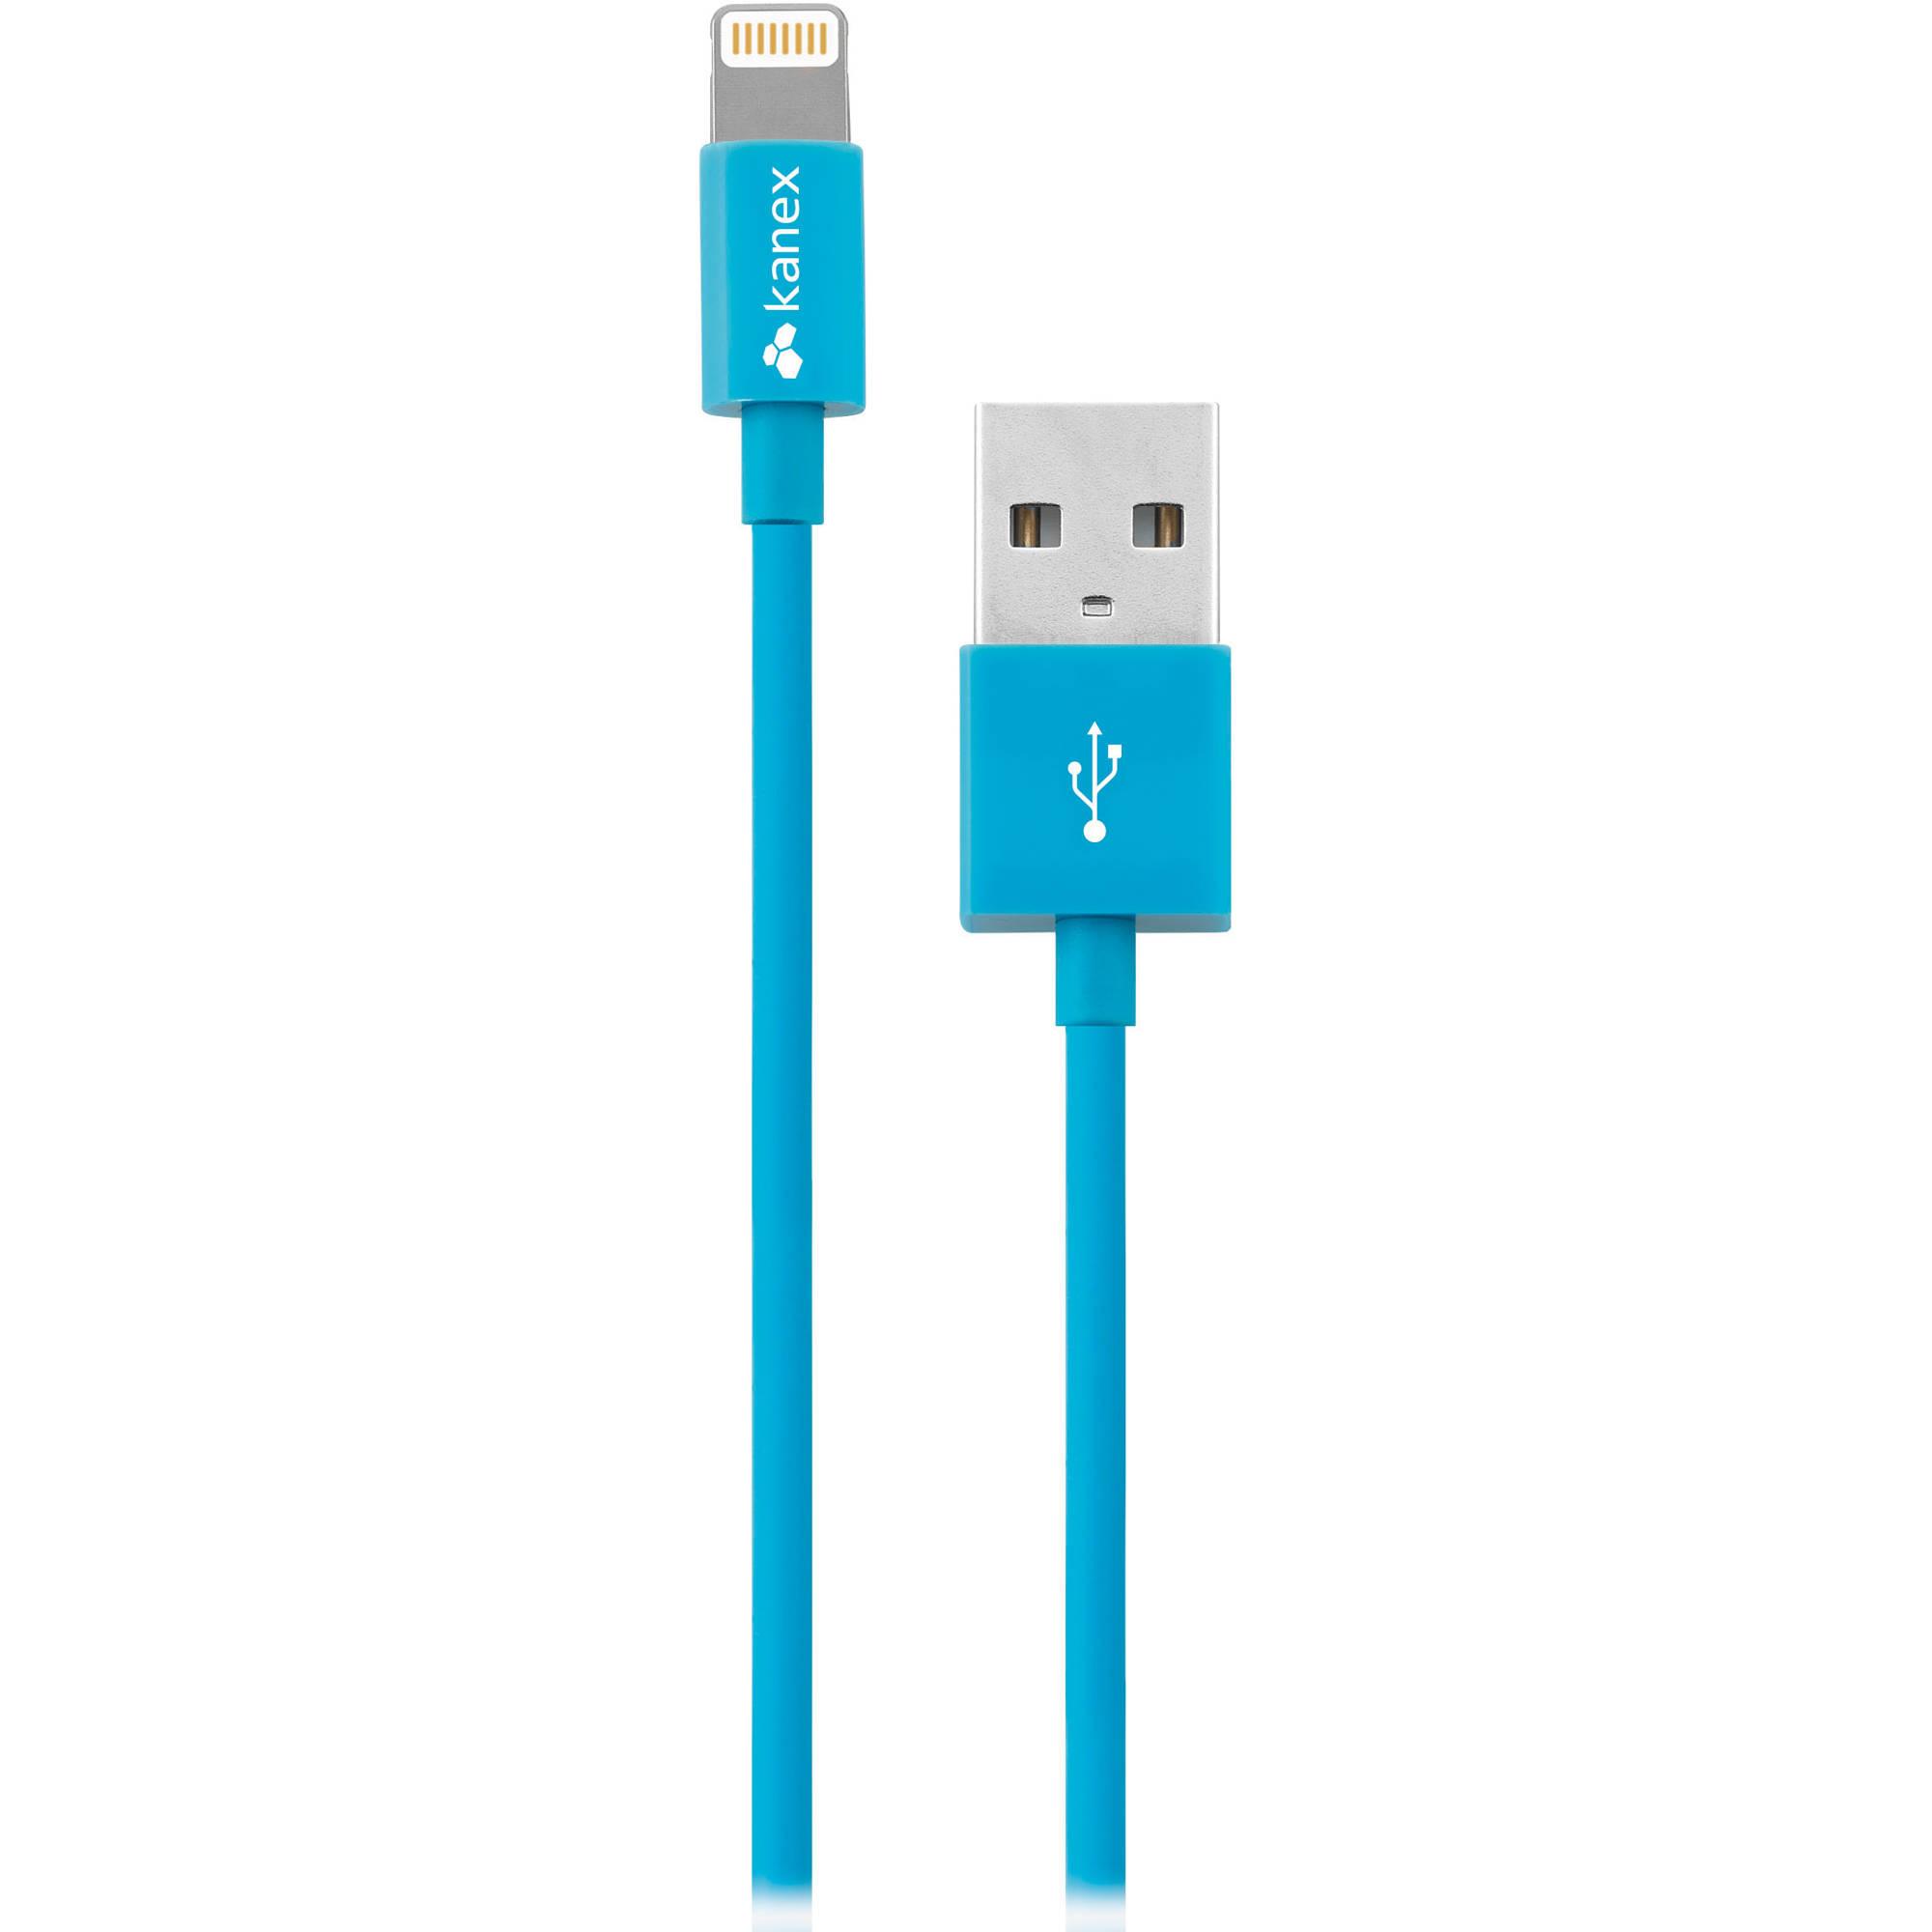 Kanex Lightning to USB Cable (4\', Blue) K8PIN4FBL B&H Photo